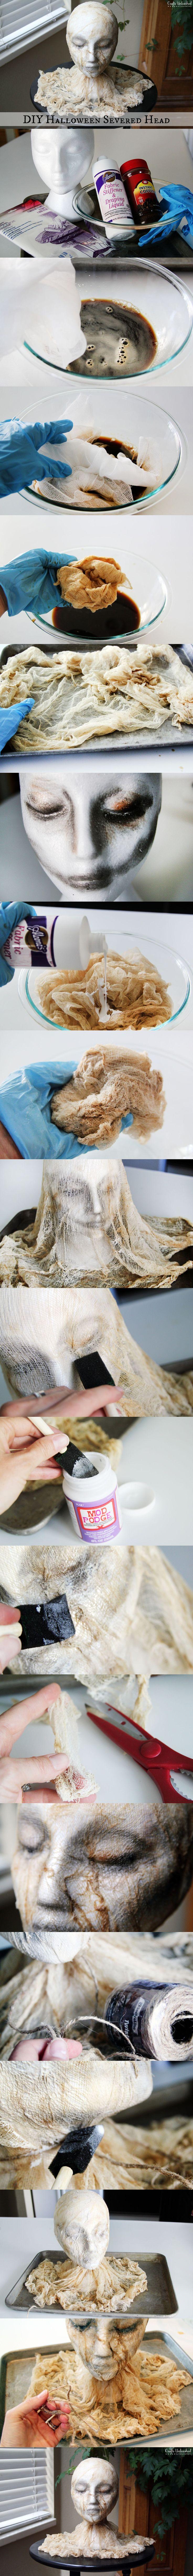 Best 25+ Scary halloween decorations ideas on Pinterest | Spooky ...